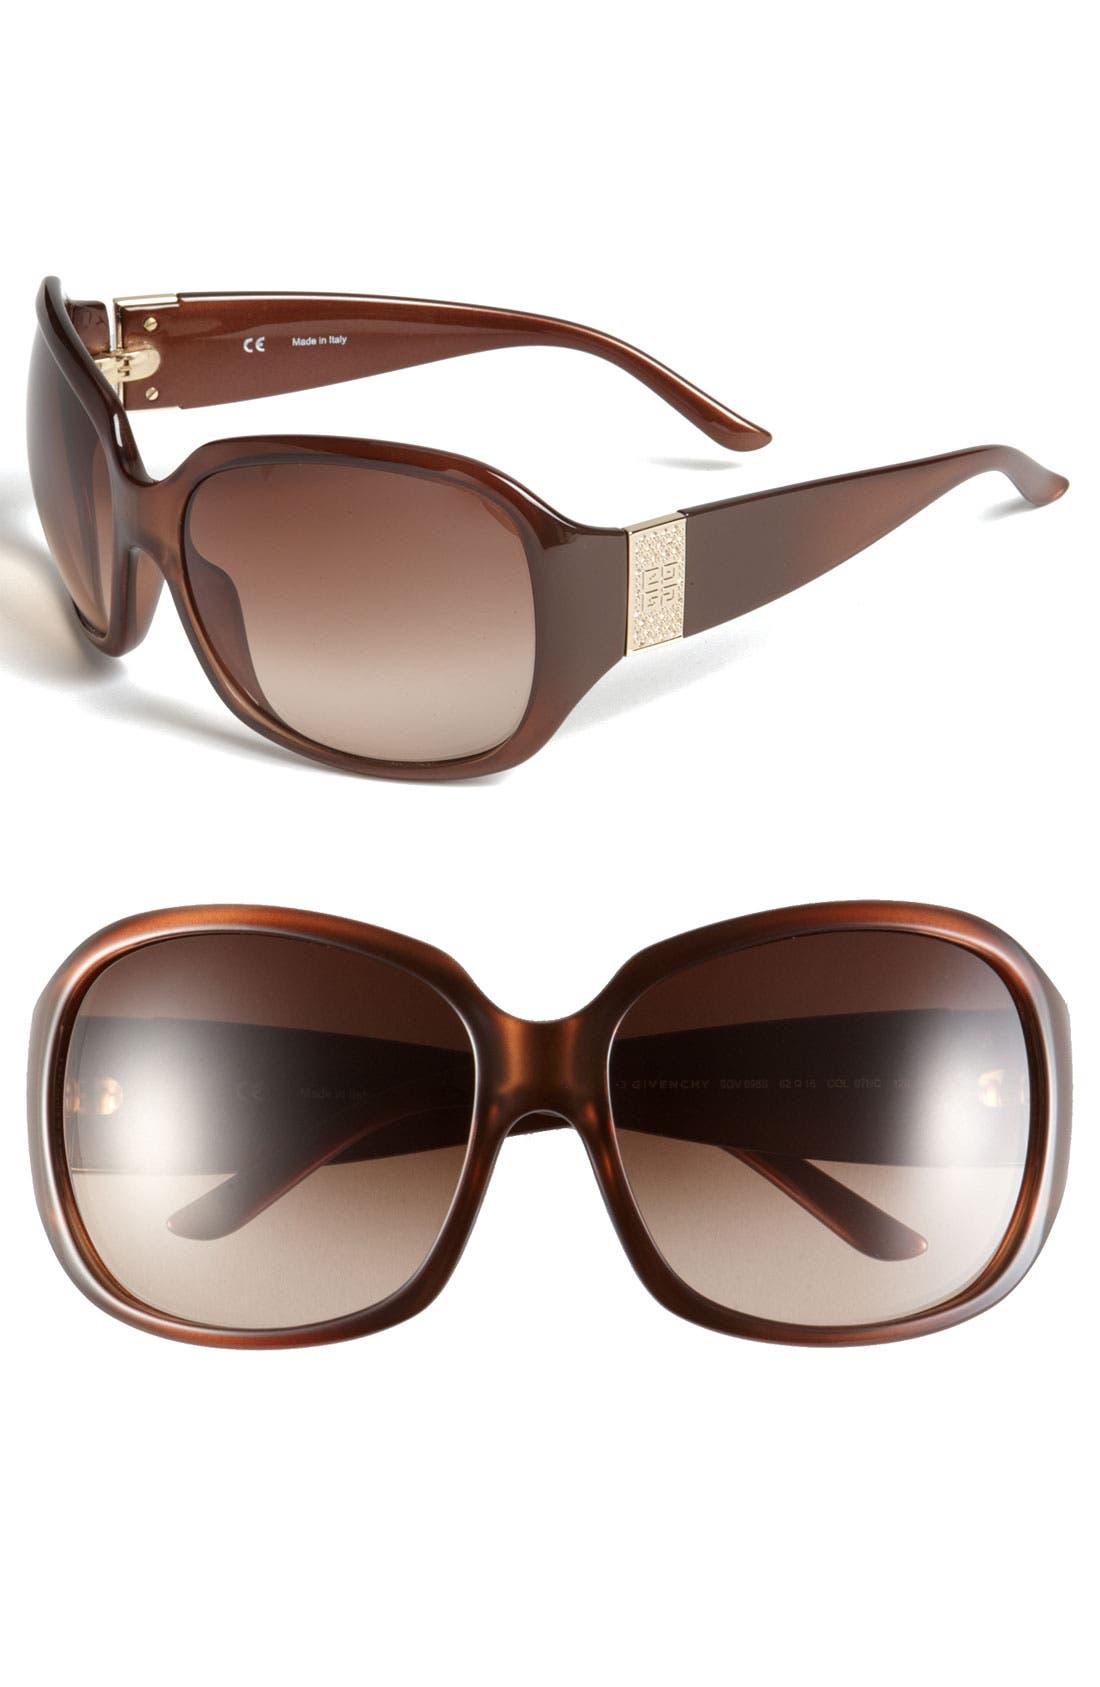 Main Image - Givenchy Sunglasses